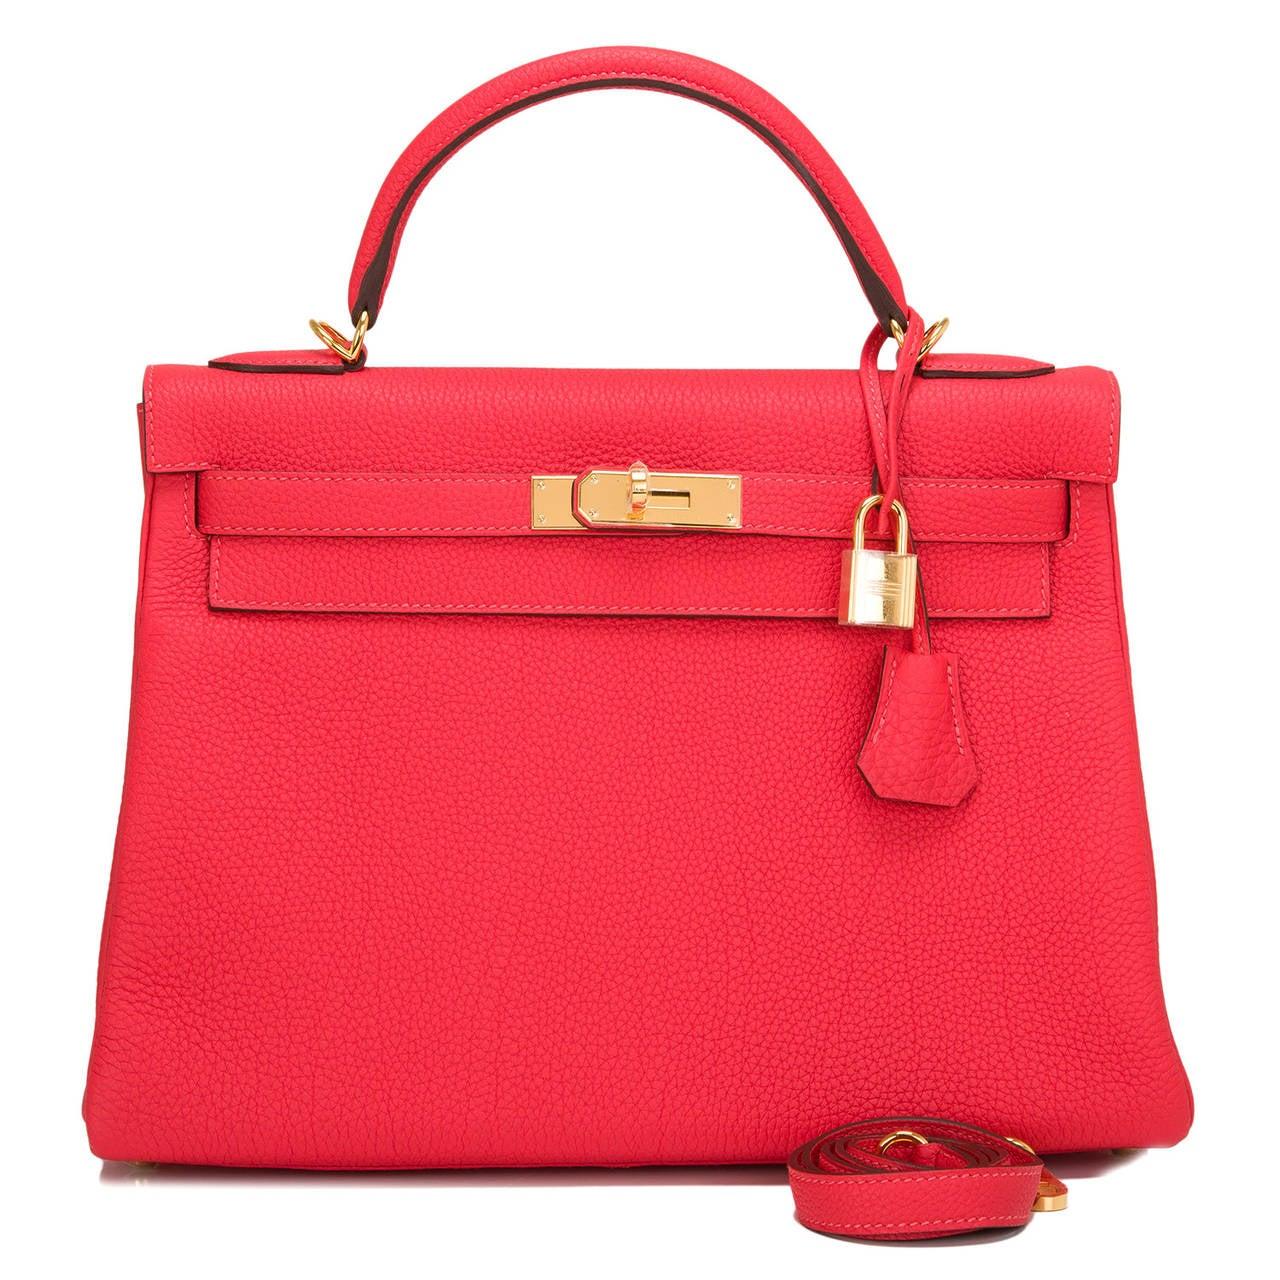 fake hermes leather purses - Hermes Rouge Pivoine Togo Kelly 32cm Gold Hardware at 1stdibs